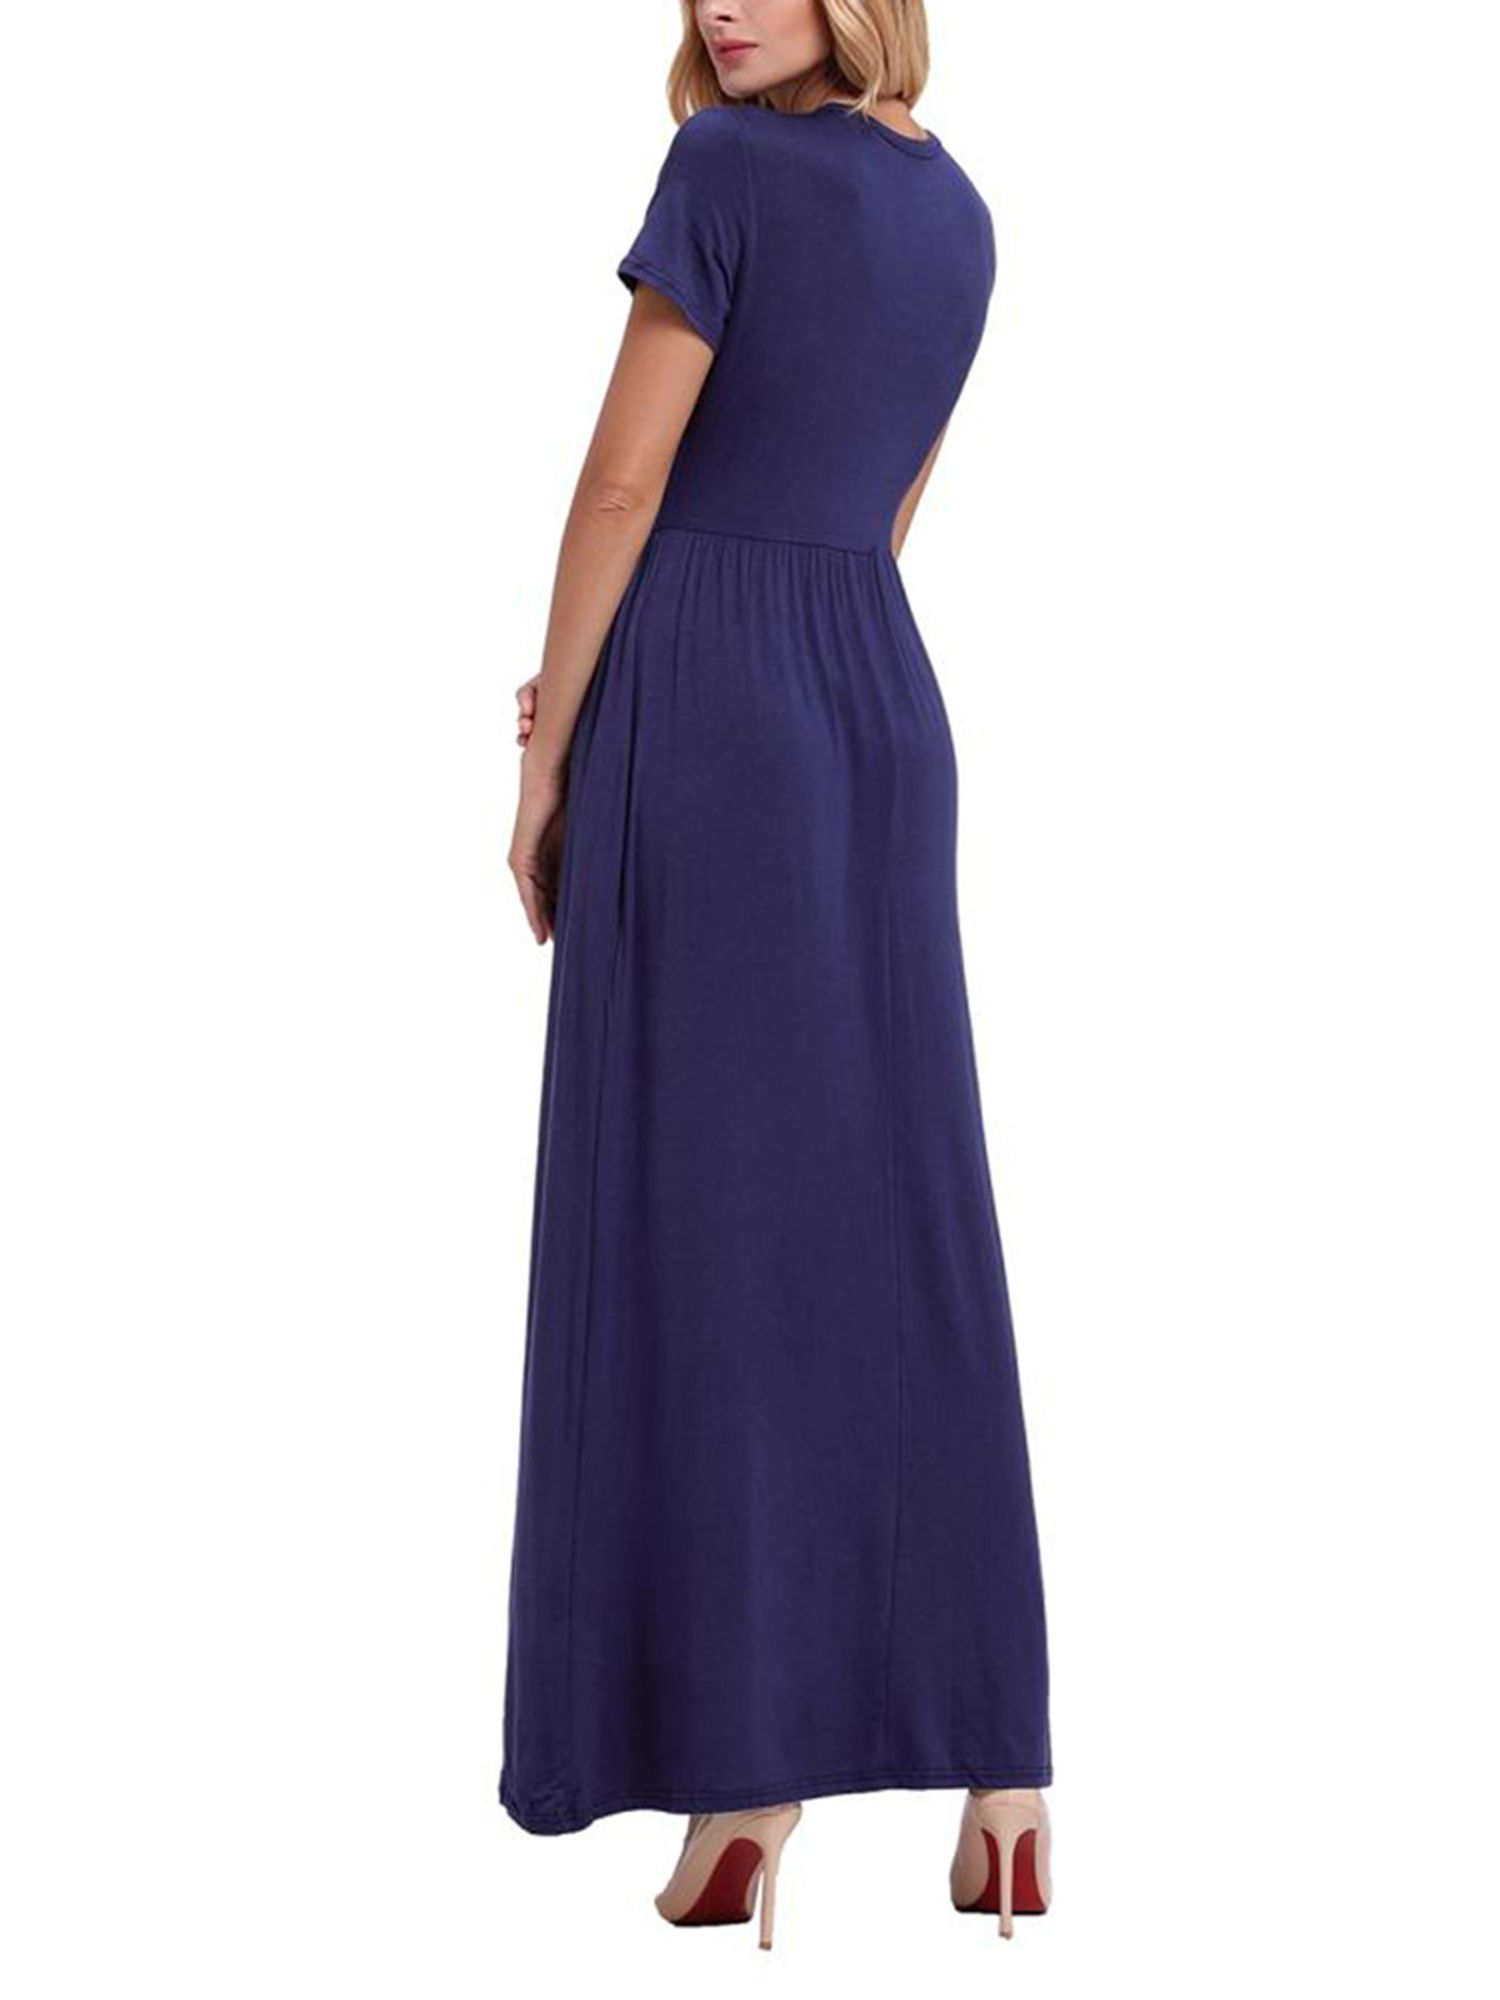 2f9b3d410 Women Long Maxi Dresses Casual Plus Size Fashion Shirt Dresses Online Baggy  Sundress Short Sleeve Loose#Casual, #Size, #Fashion